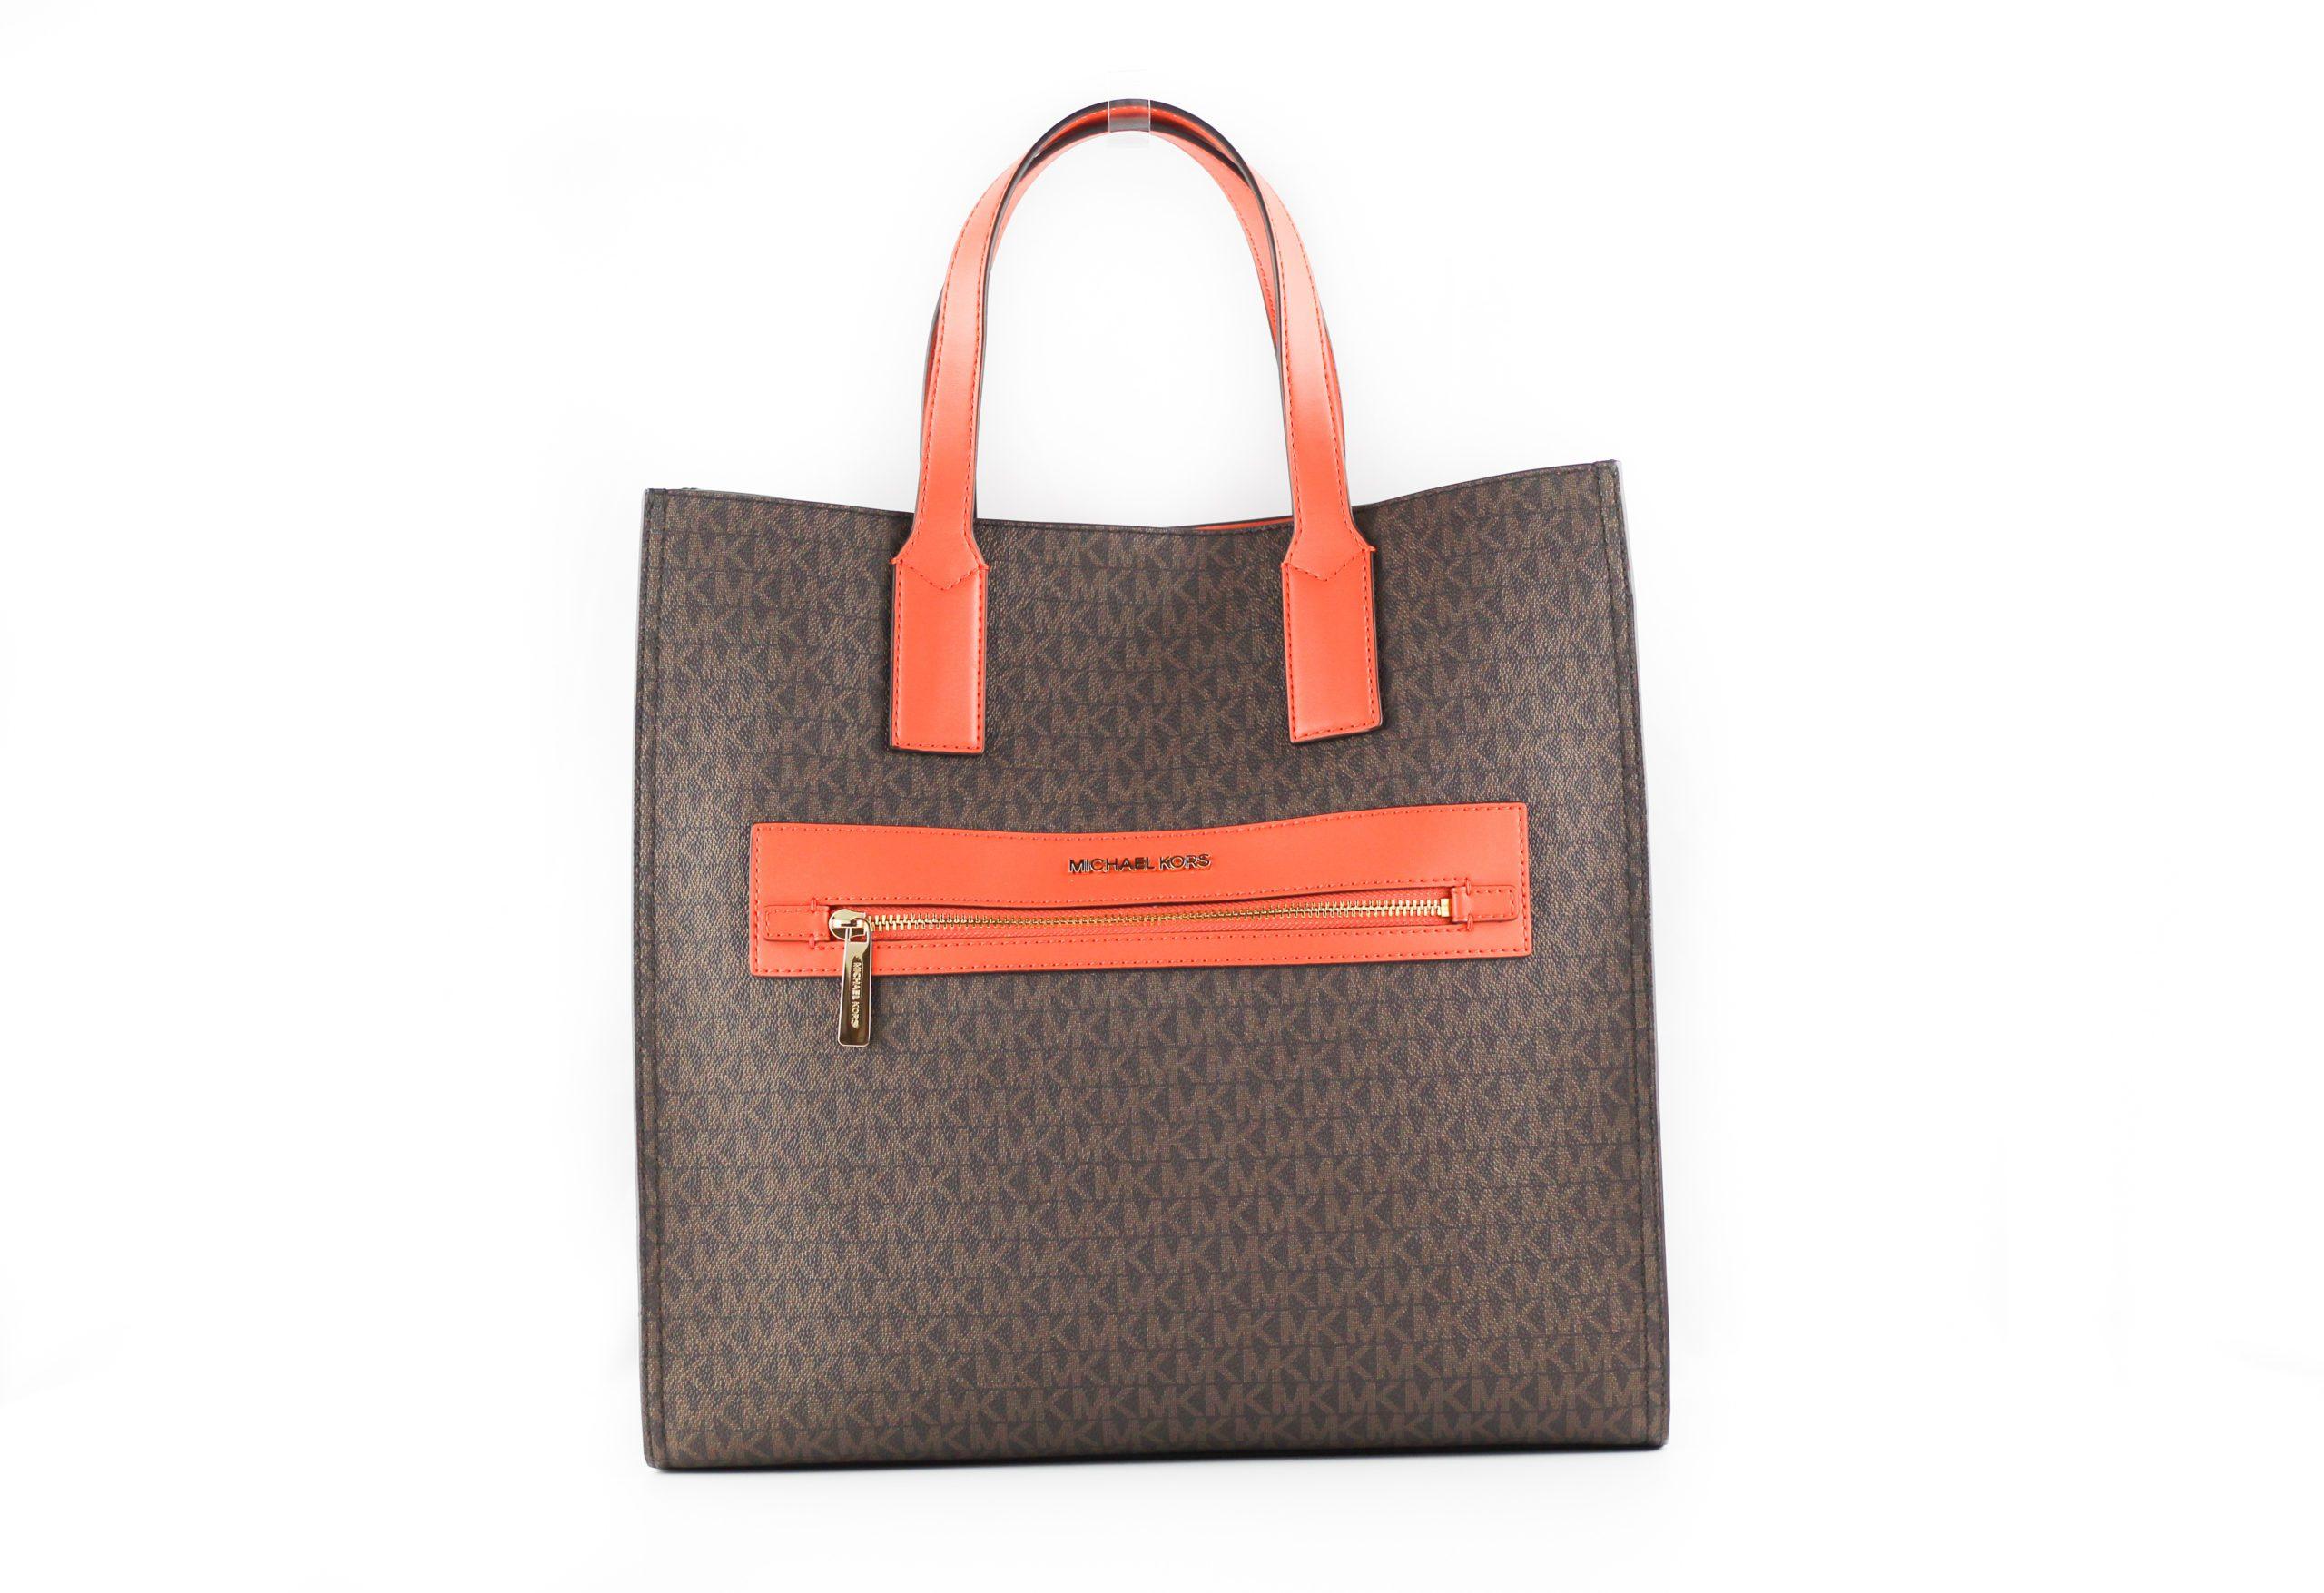 Michael Kors Women's Kenly Tote Bag Tangerine 39892